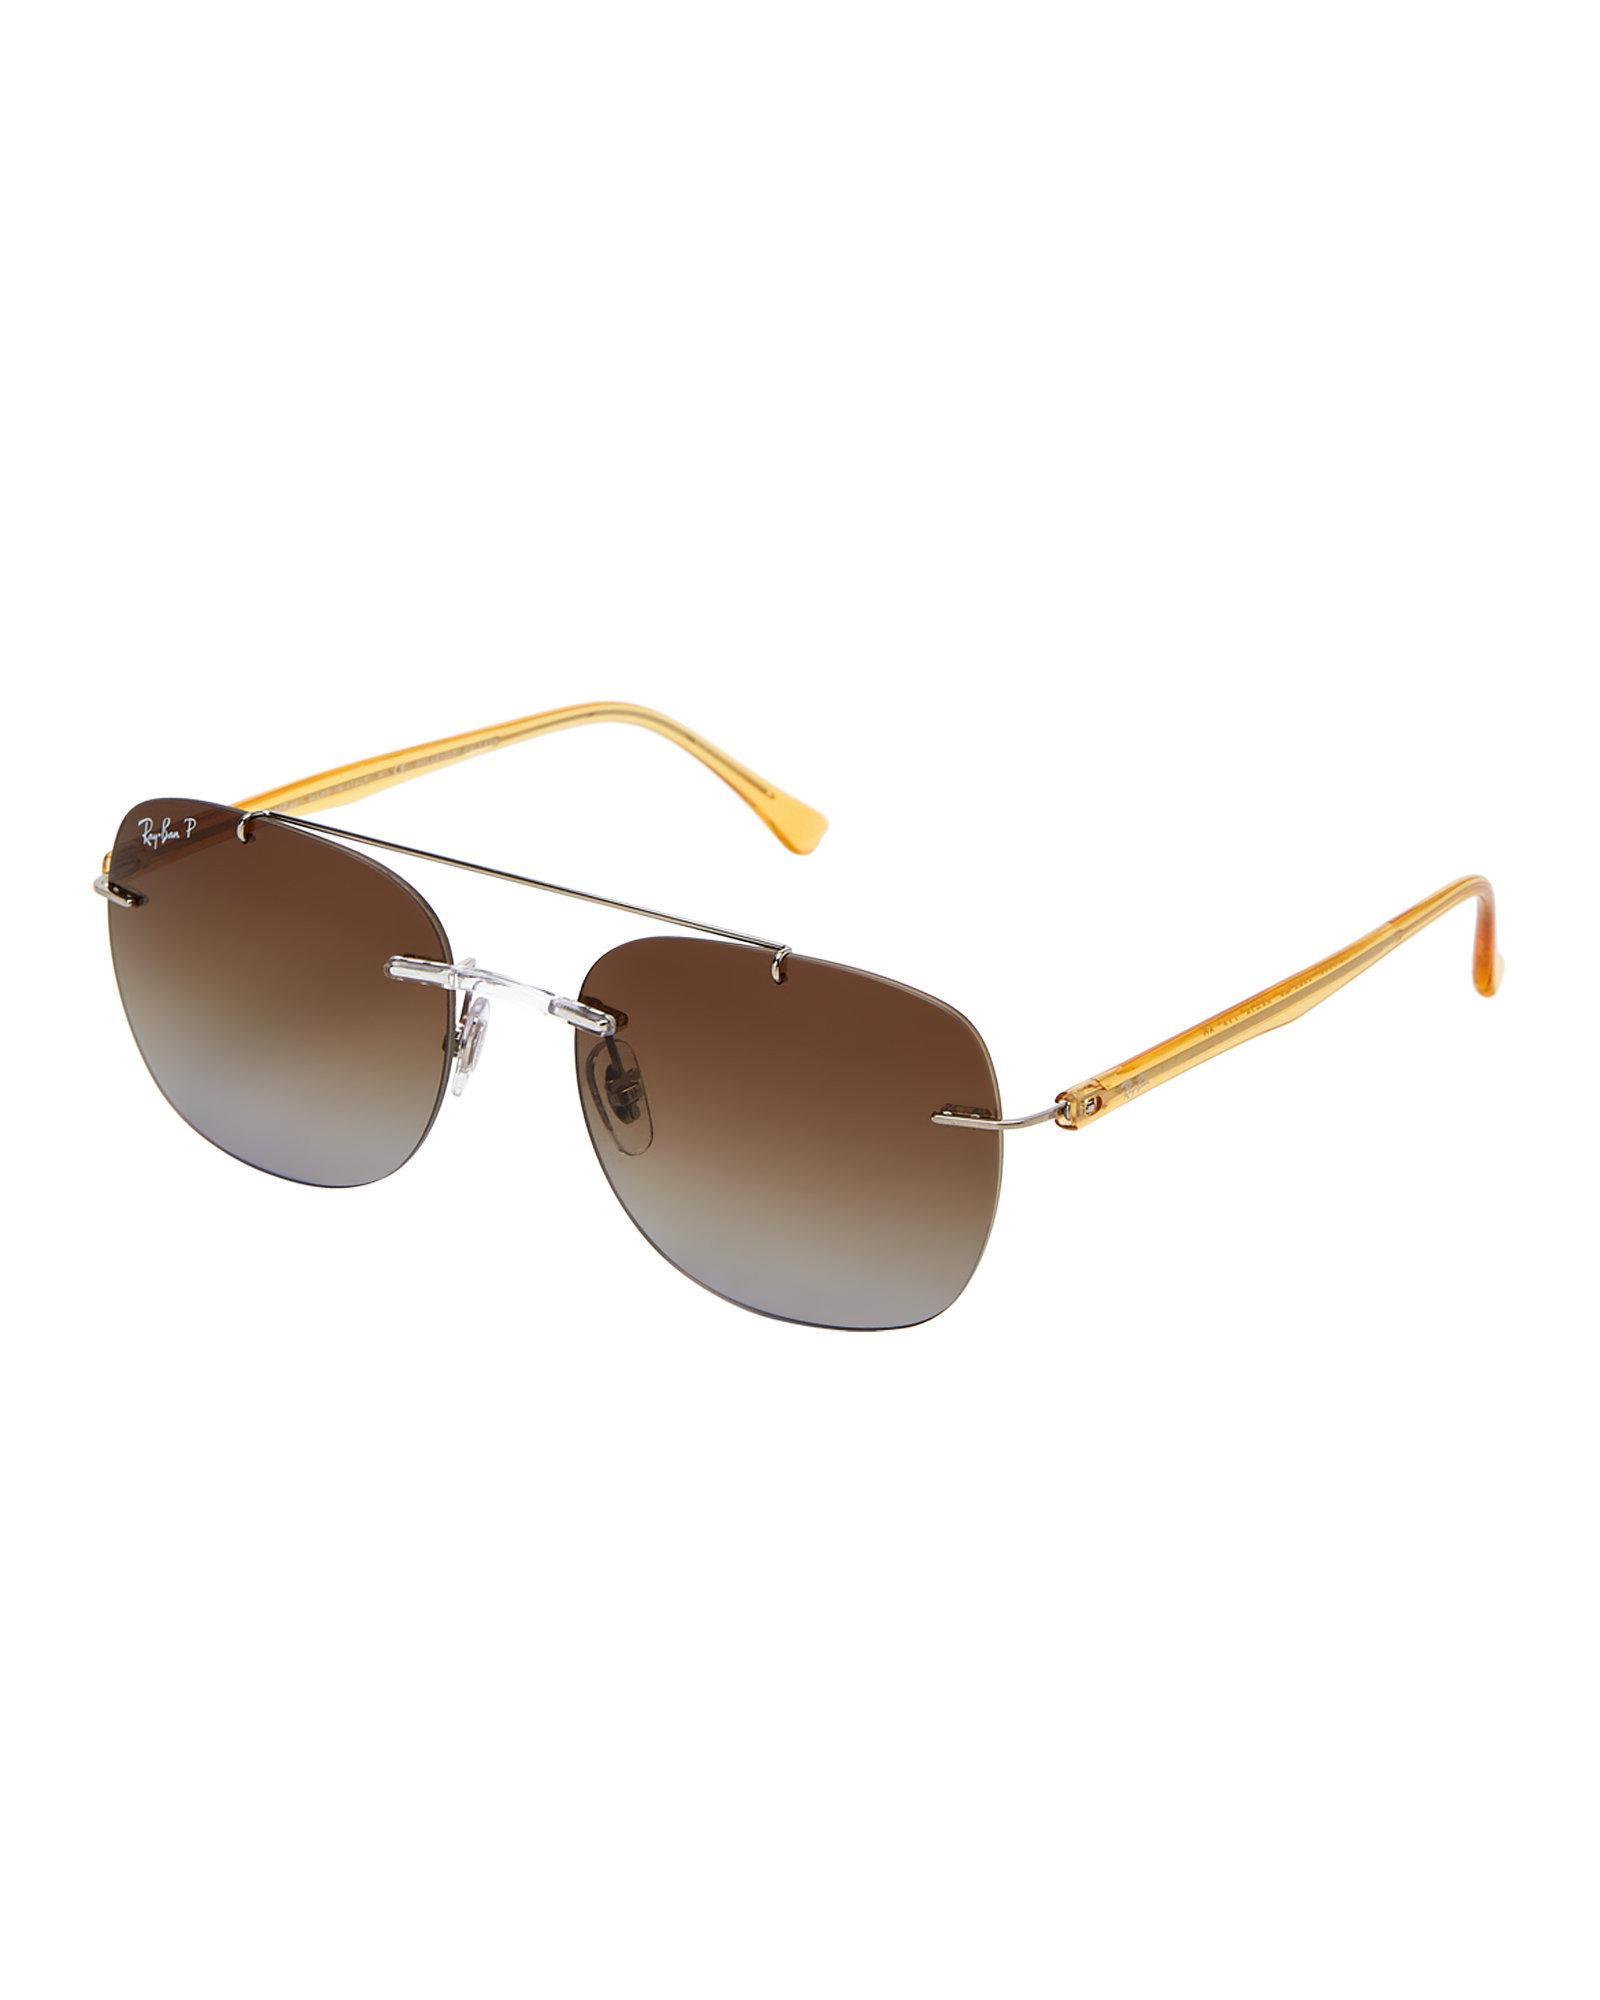 cc475c6349c Lyst - Ray-Ban Rb 4280 Smoke Navigator Sunglasses